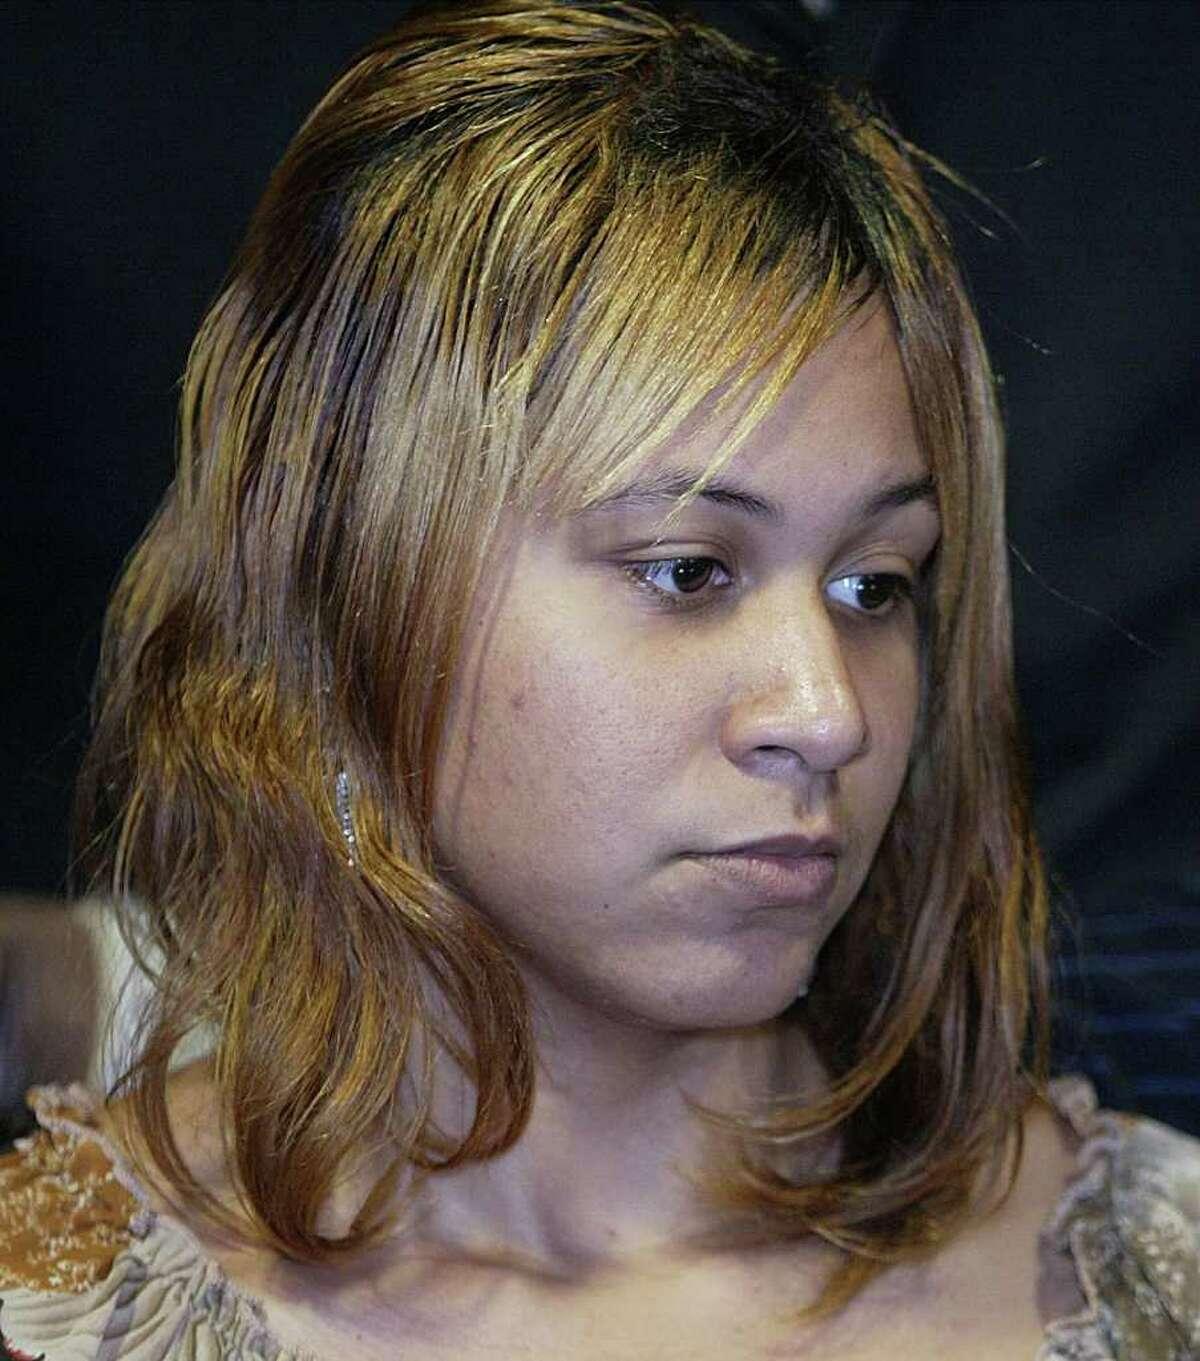 Kendrick's mother Keyanna, shown in 2006.